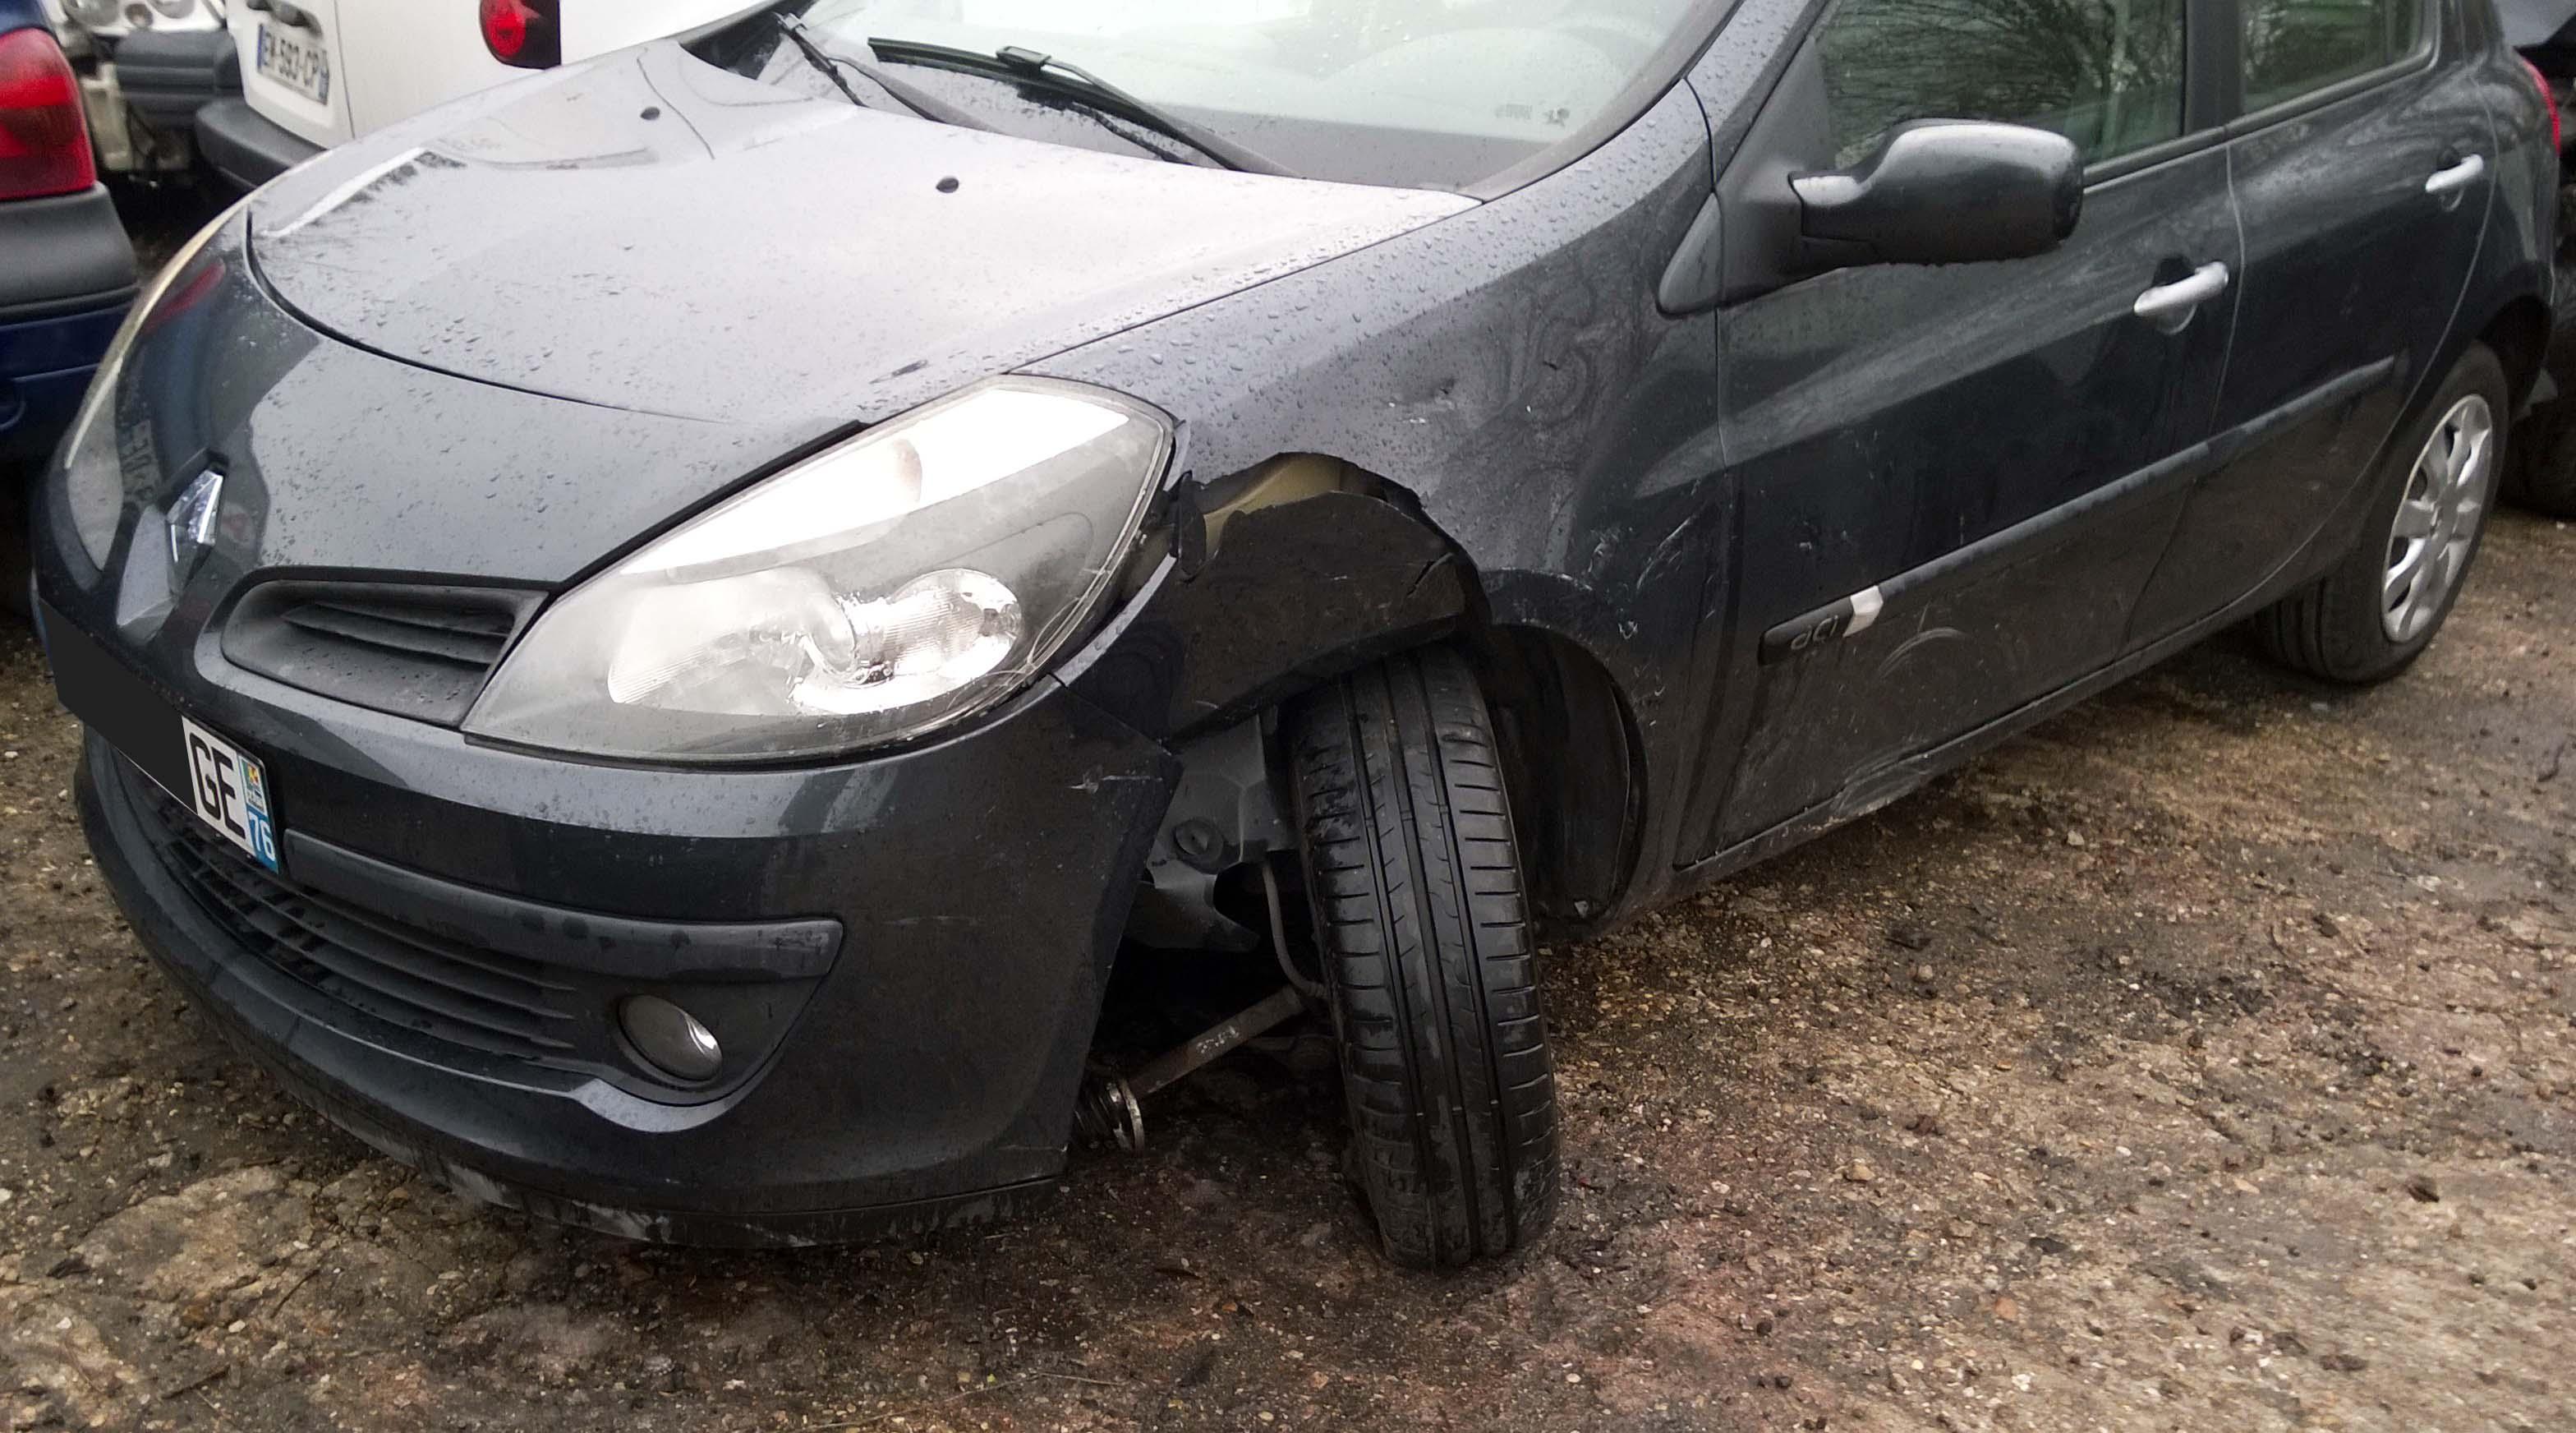 Renault clio 1.5 dci 85 accidentée